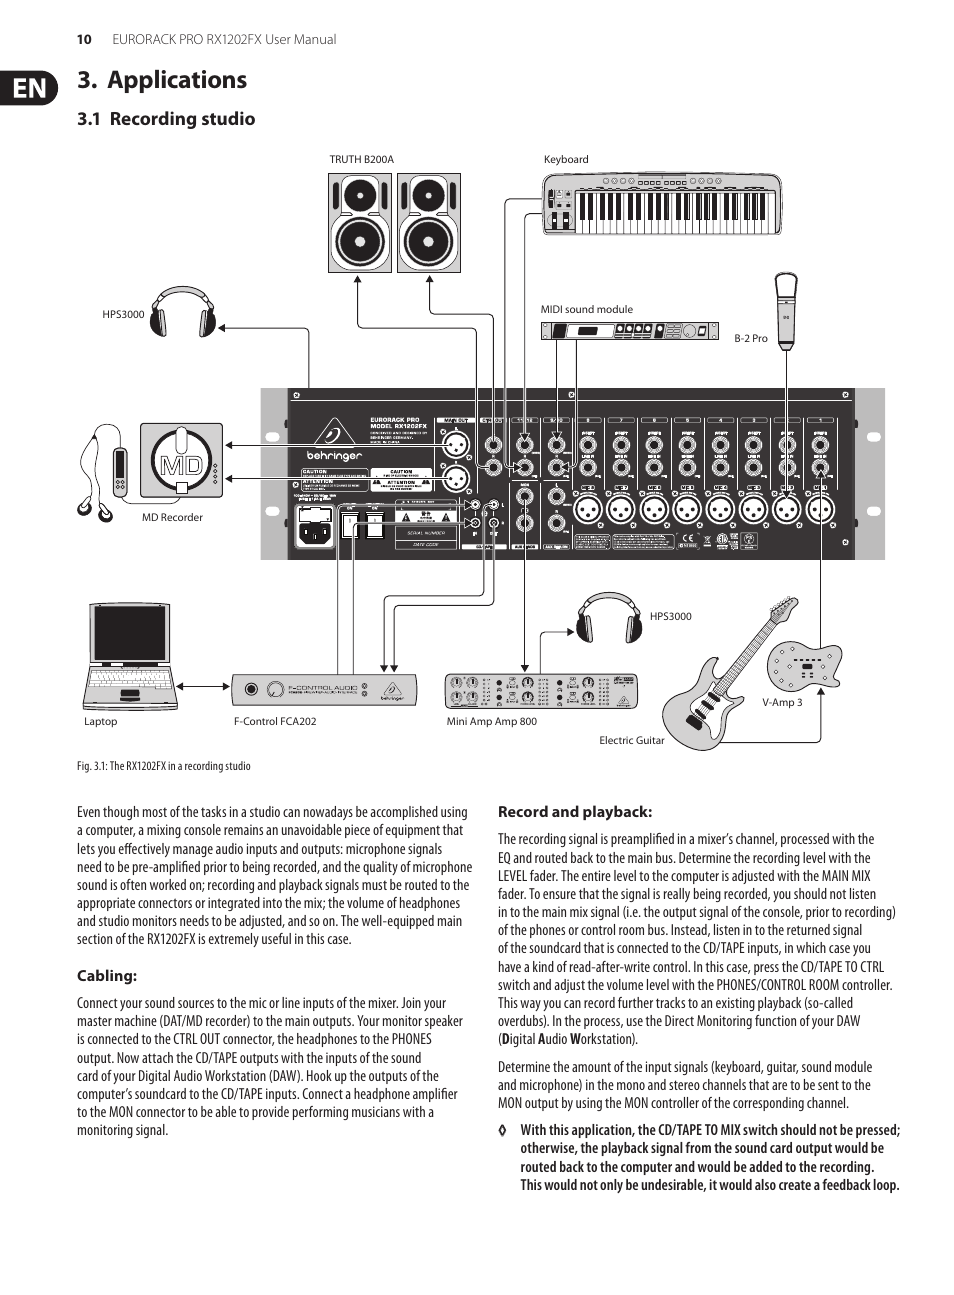 applications 1 recording studio behringer eurorack pro rx1202fx rh manualsdir com Behringer 1202FX Mixer Behringer Eurorack Pro